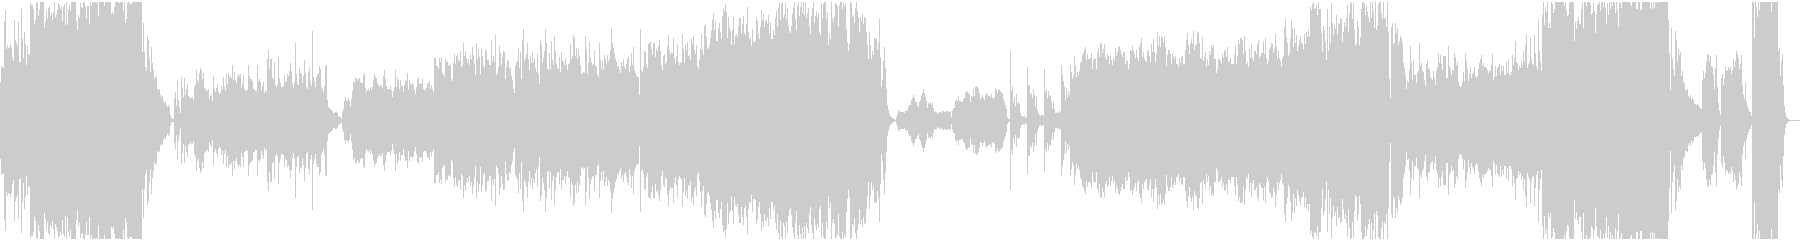 Grand Romantic Piano Concerto's unreproduced waveform